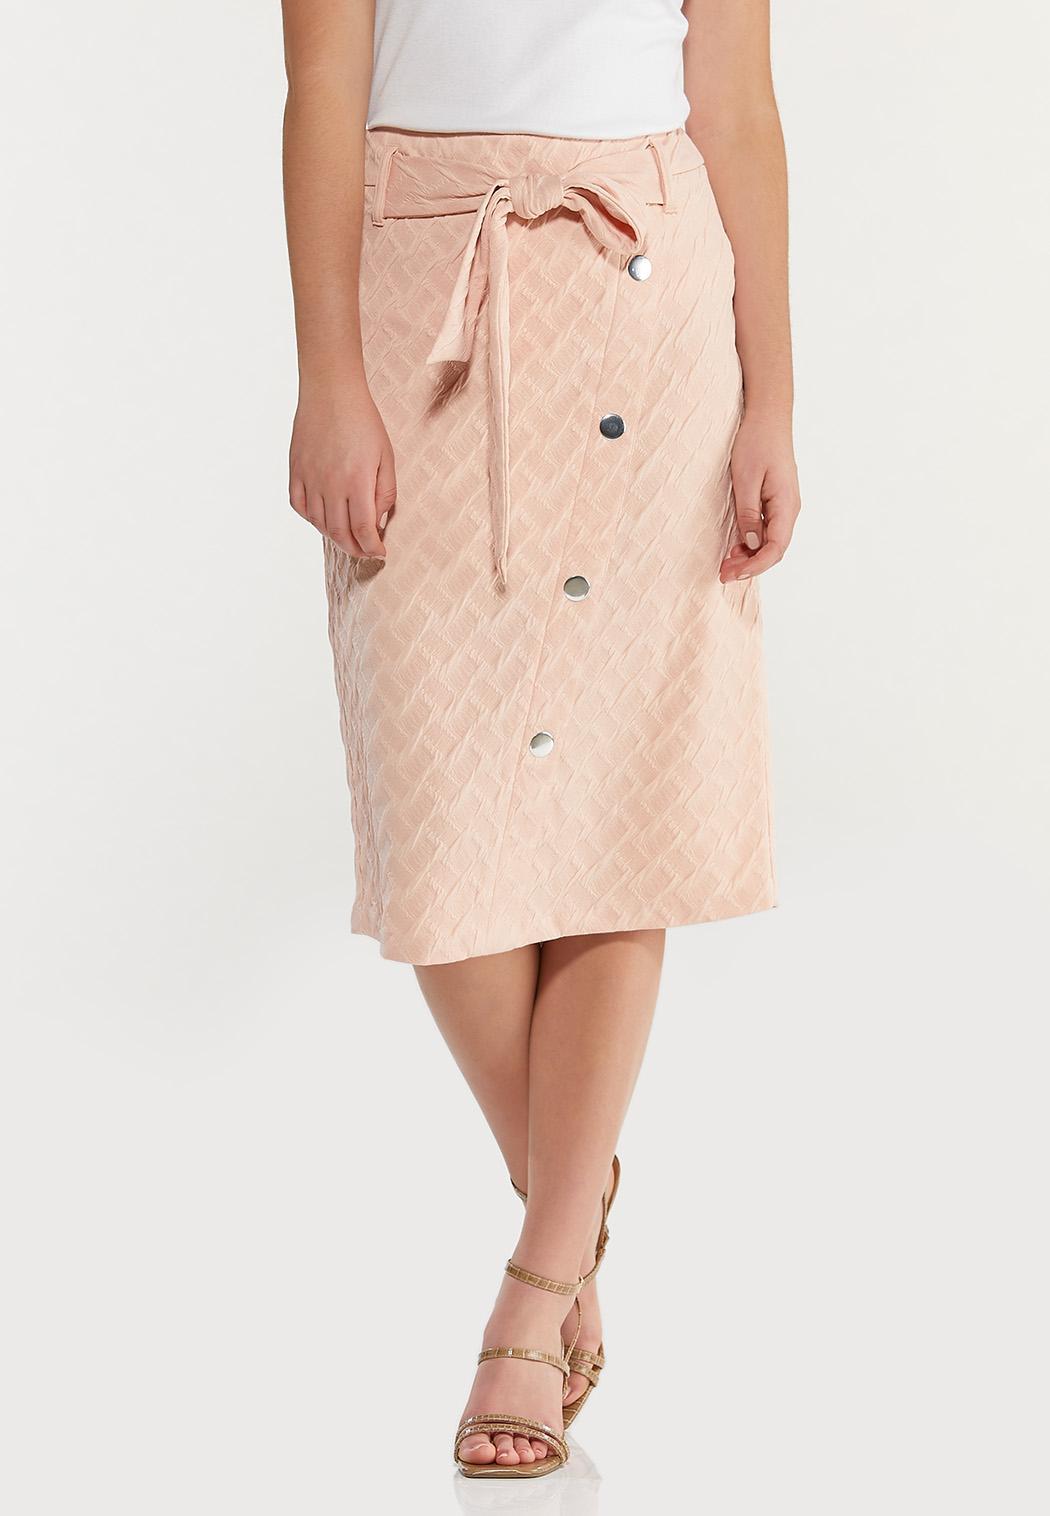 Plus Size Textured Blush Pencil Skirt